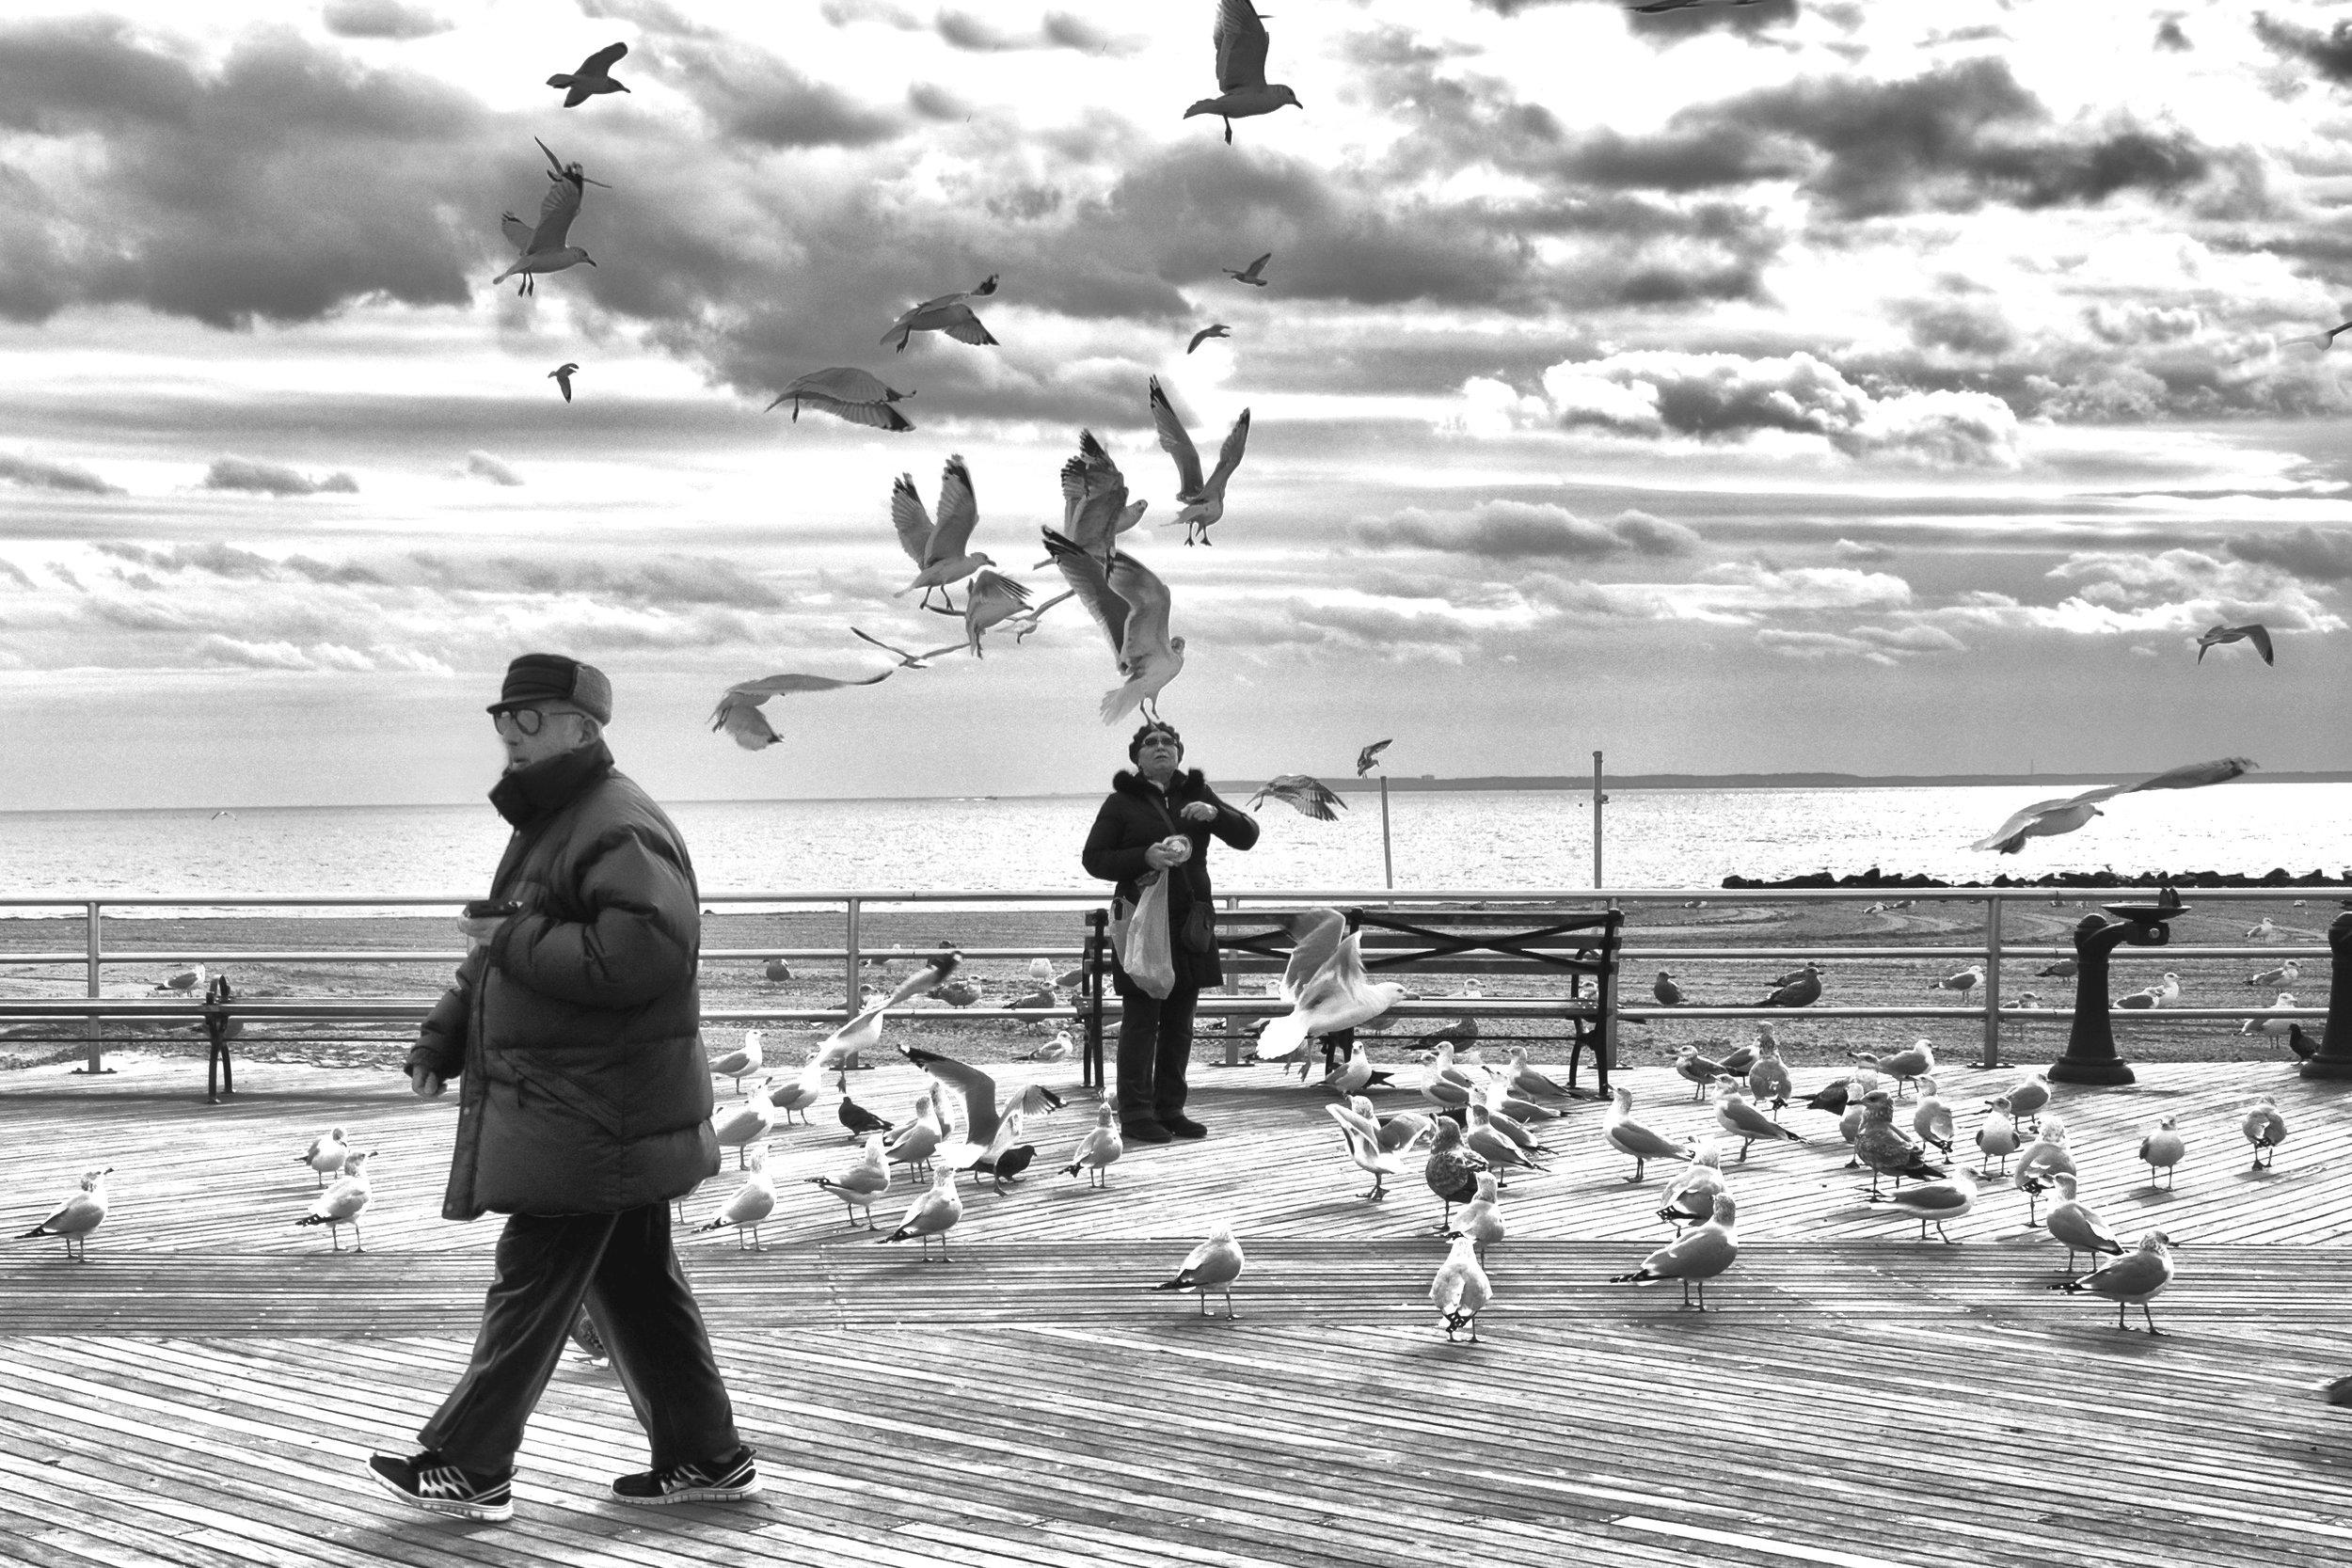 Coney Island Winter 2017